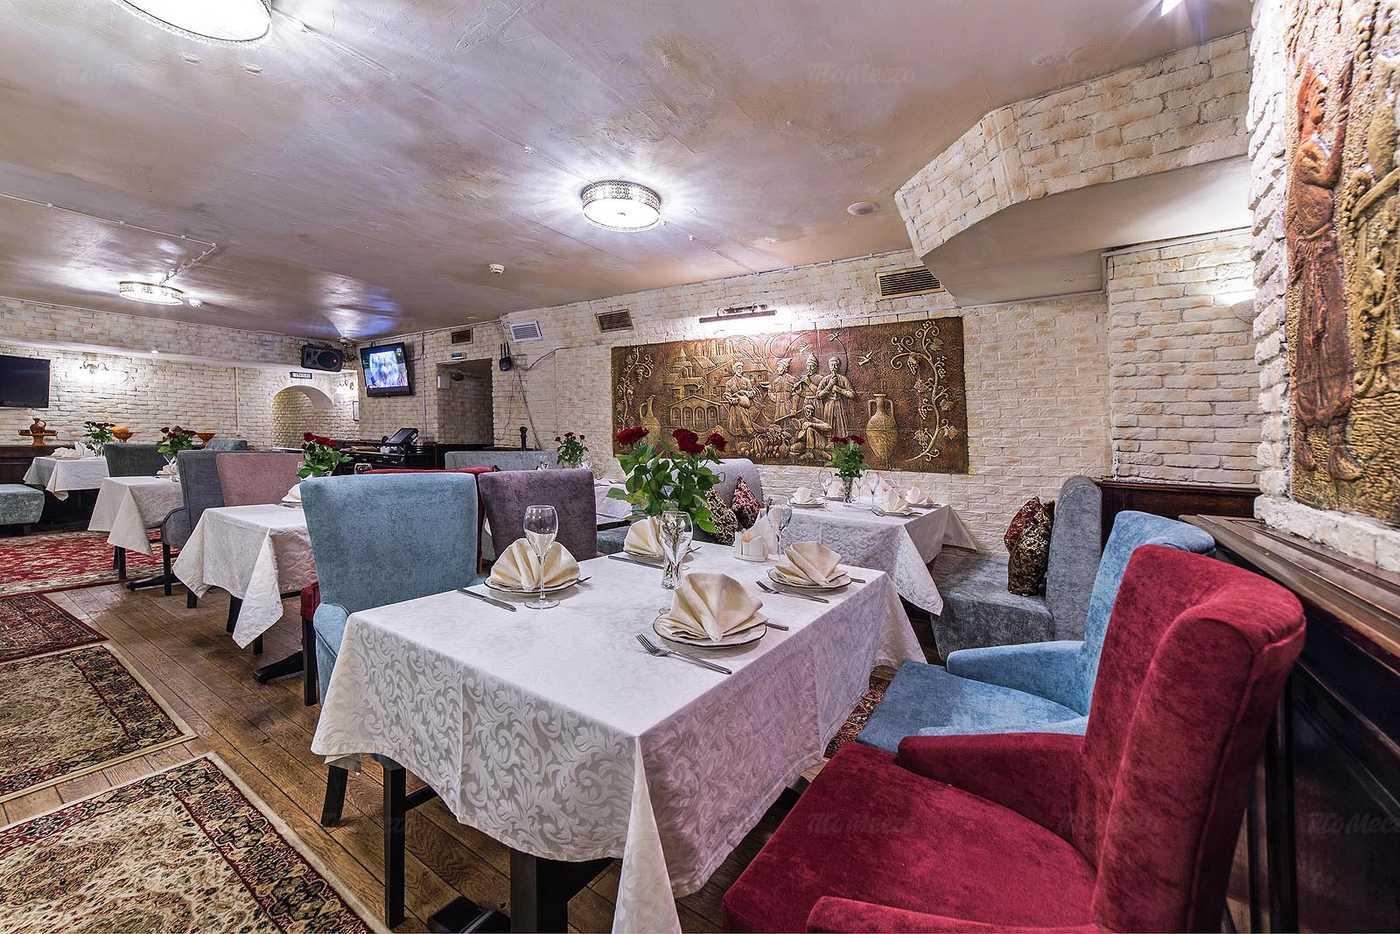 Ресторан Тамар на Караванной улице